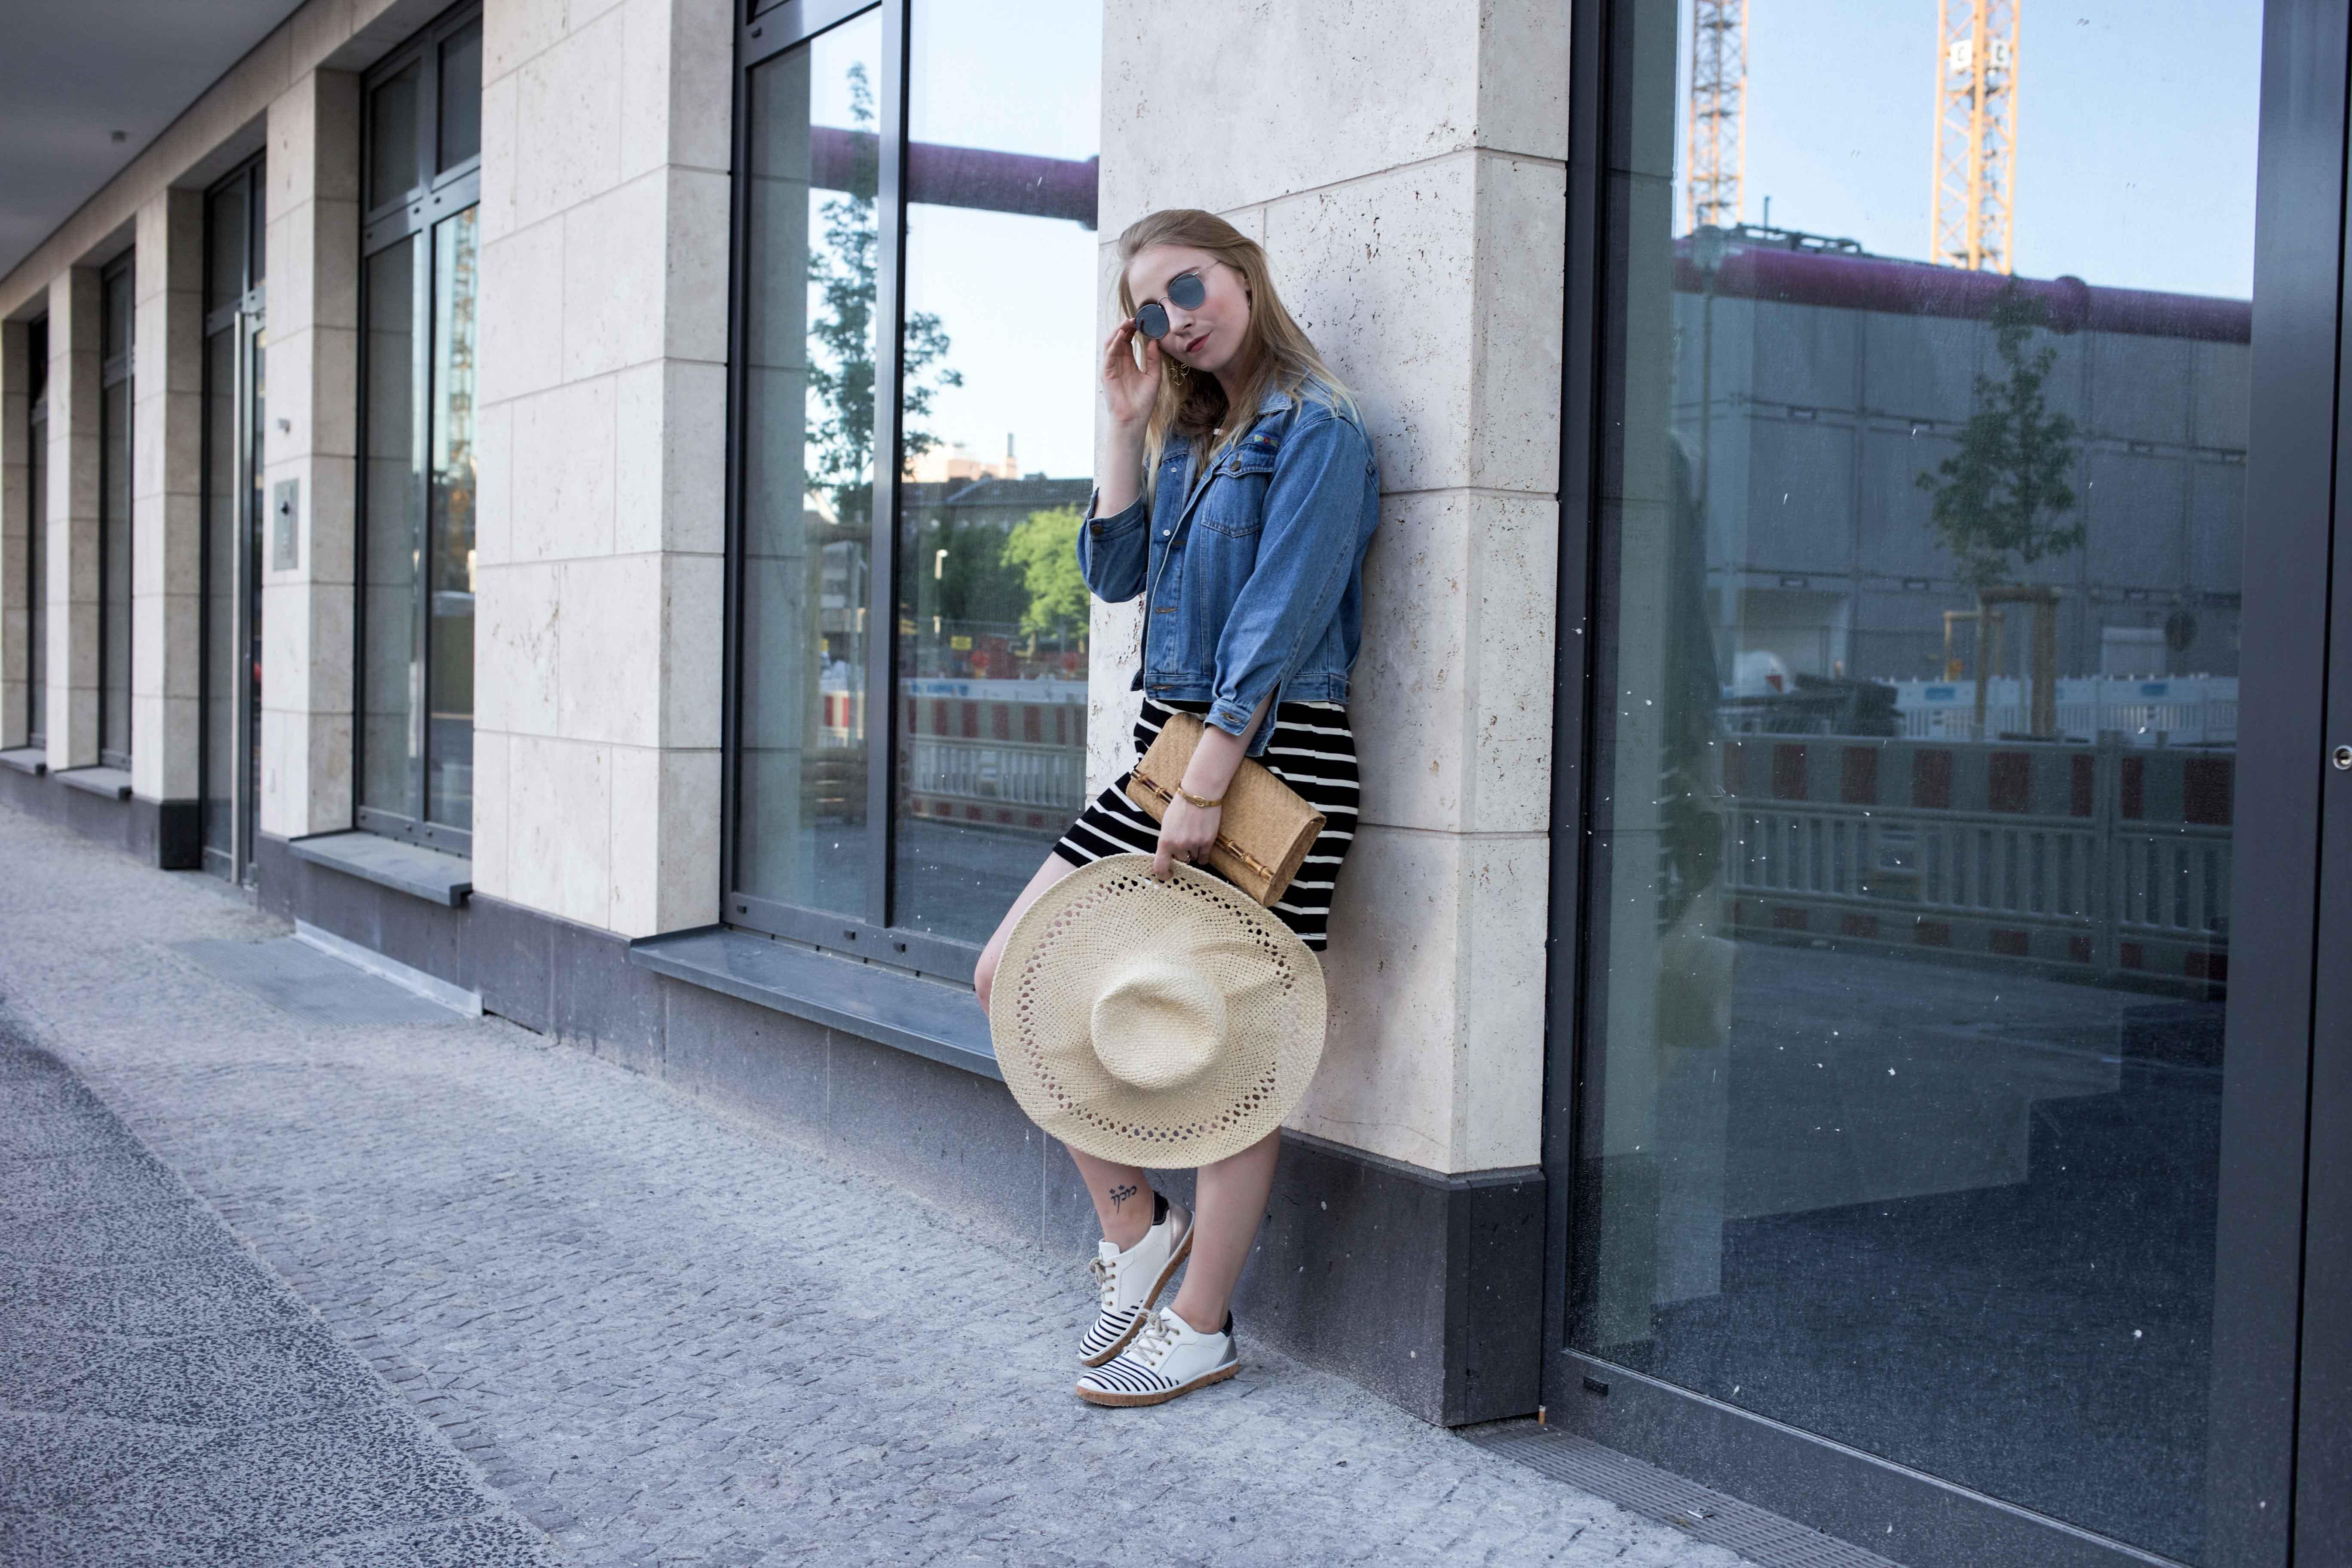 modeblog-fashionblog-berlin-köln-cologne-sonnenhut-outfit-fashion-lifestyle-sommerloo-9